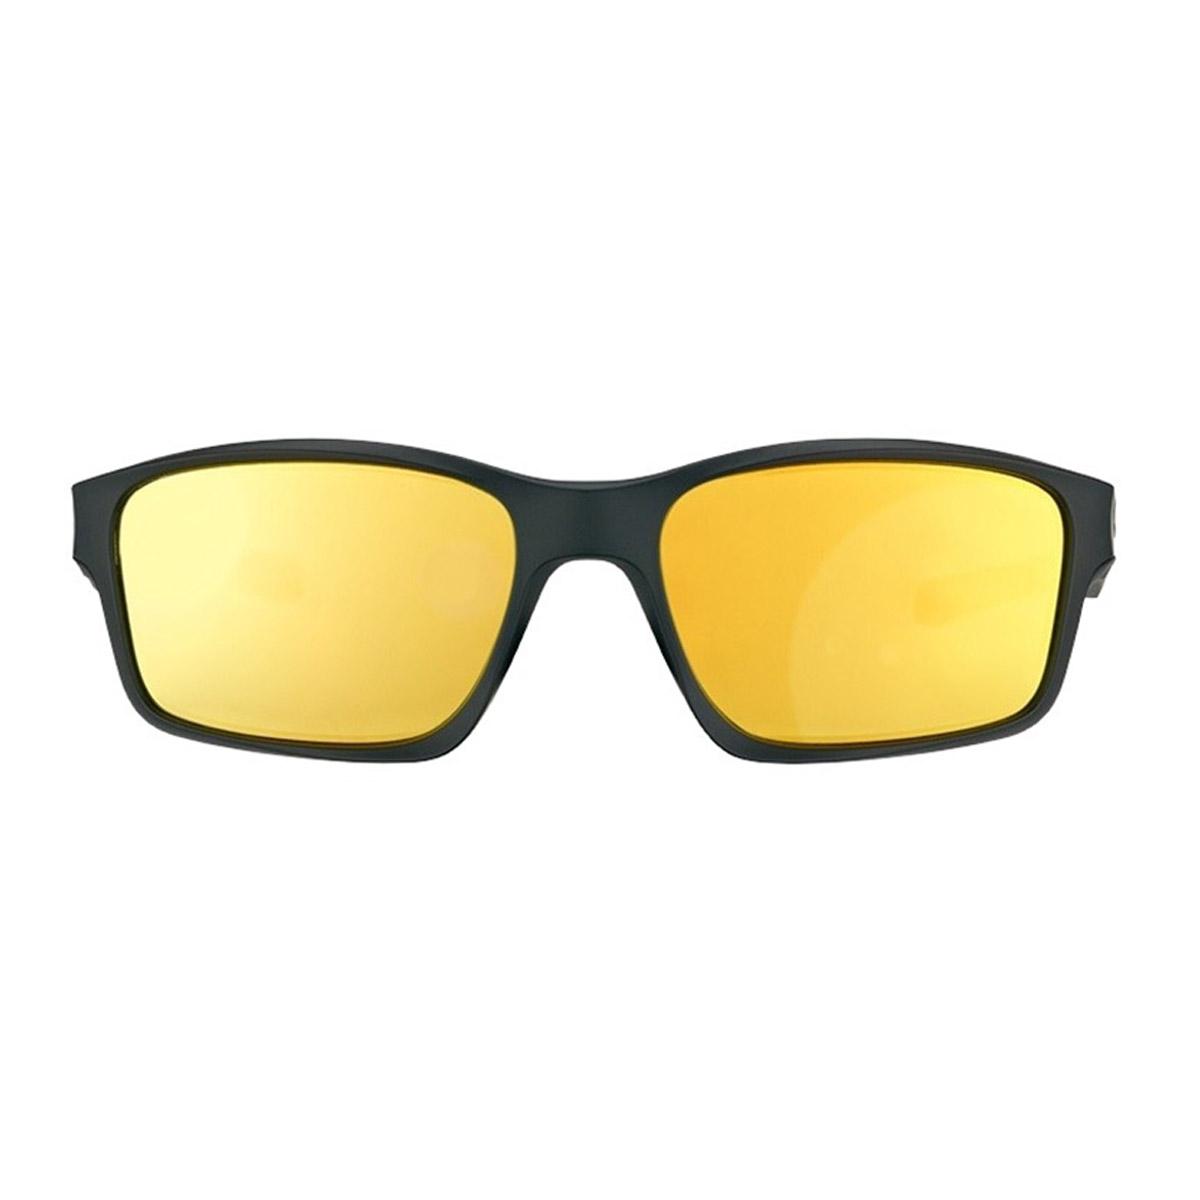 9744e29907ed8 óculos Oakley Twoface - Iridium   Louisiana Bucket Brigade